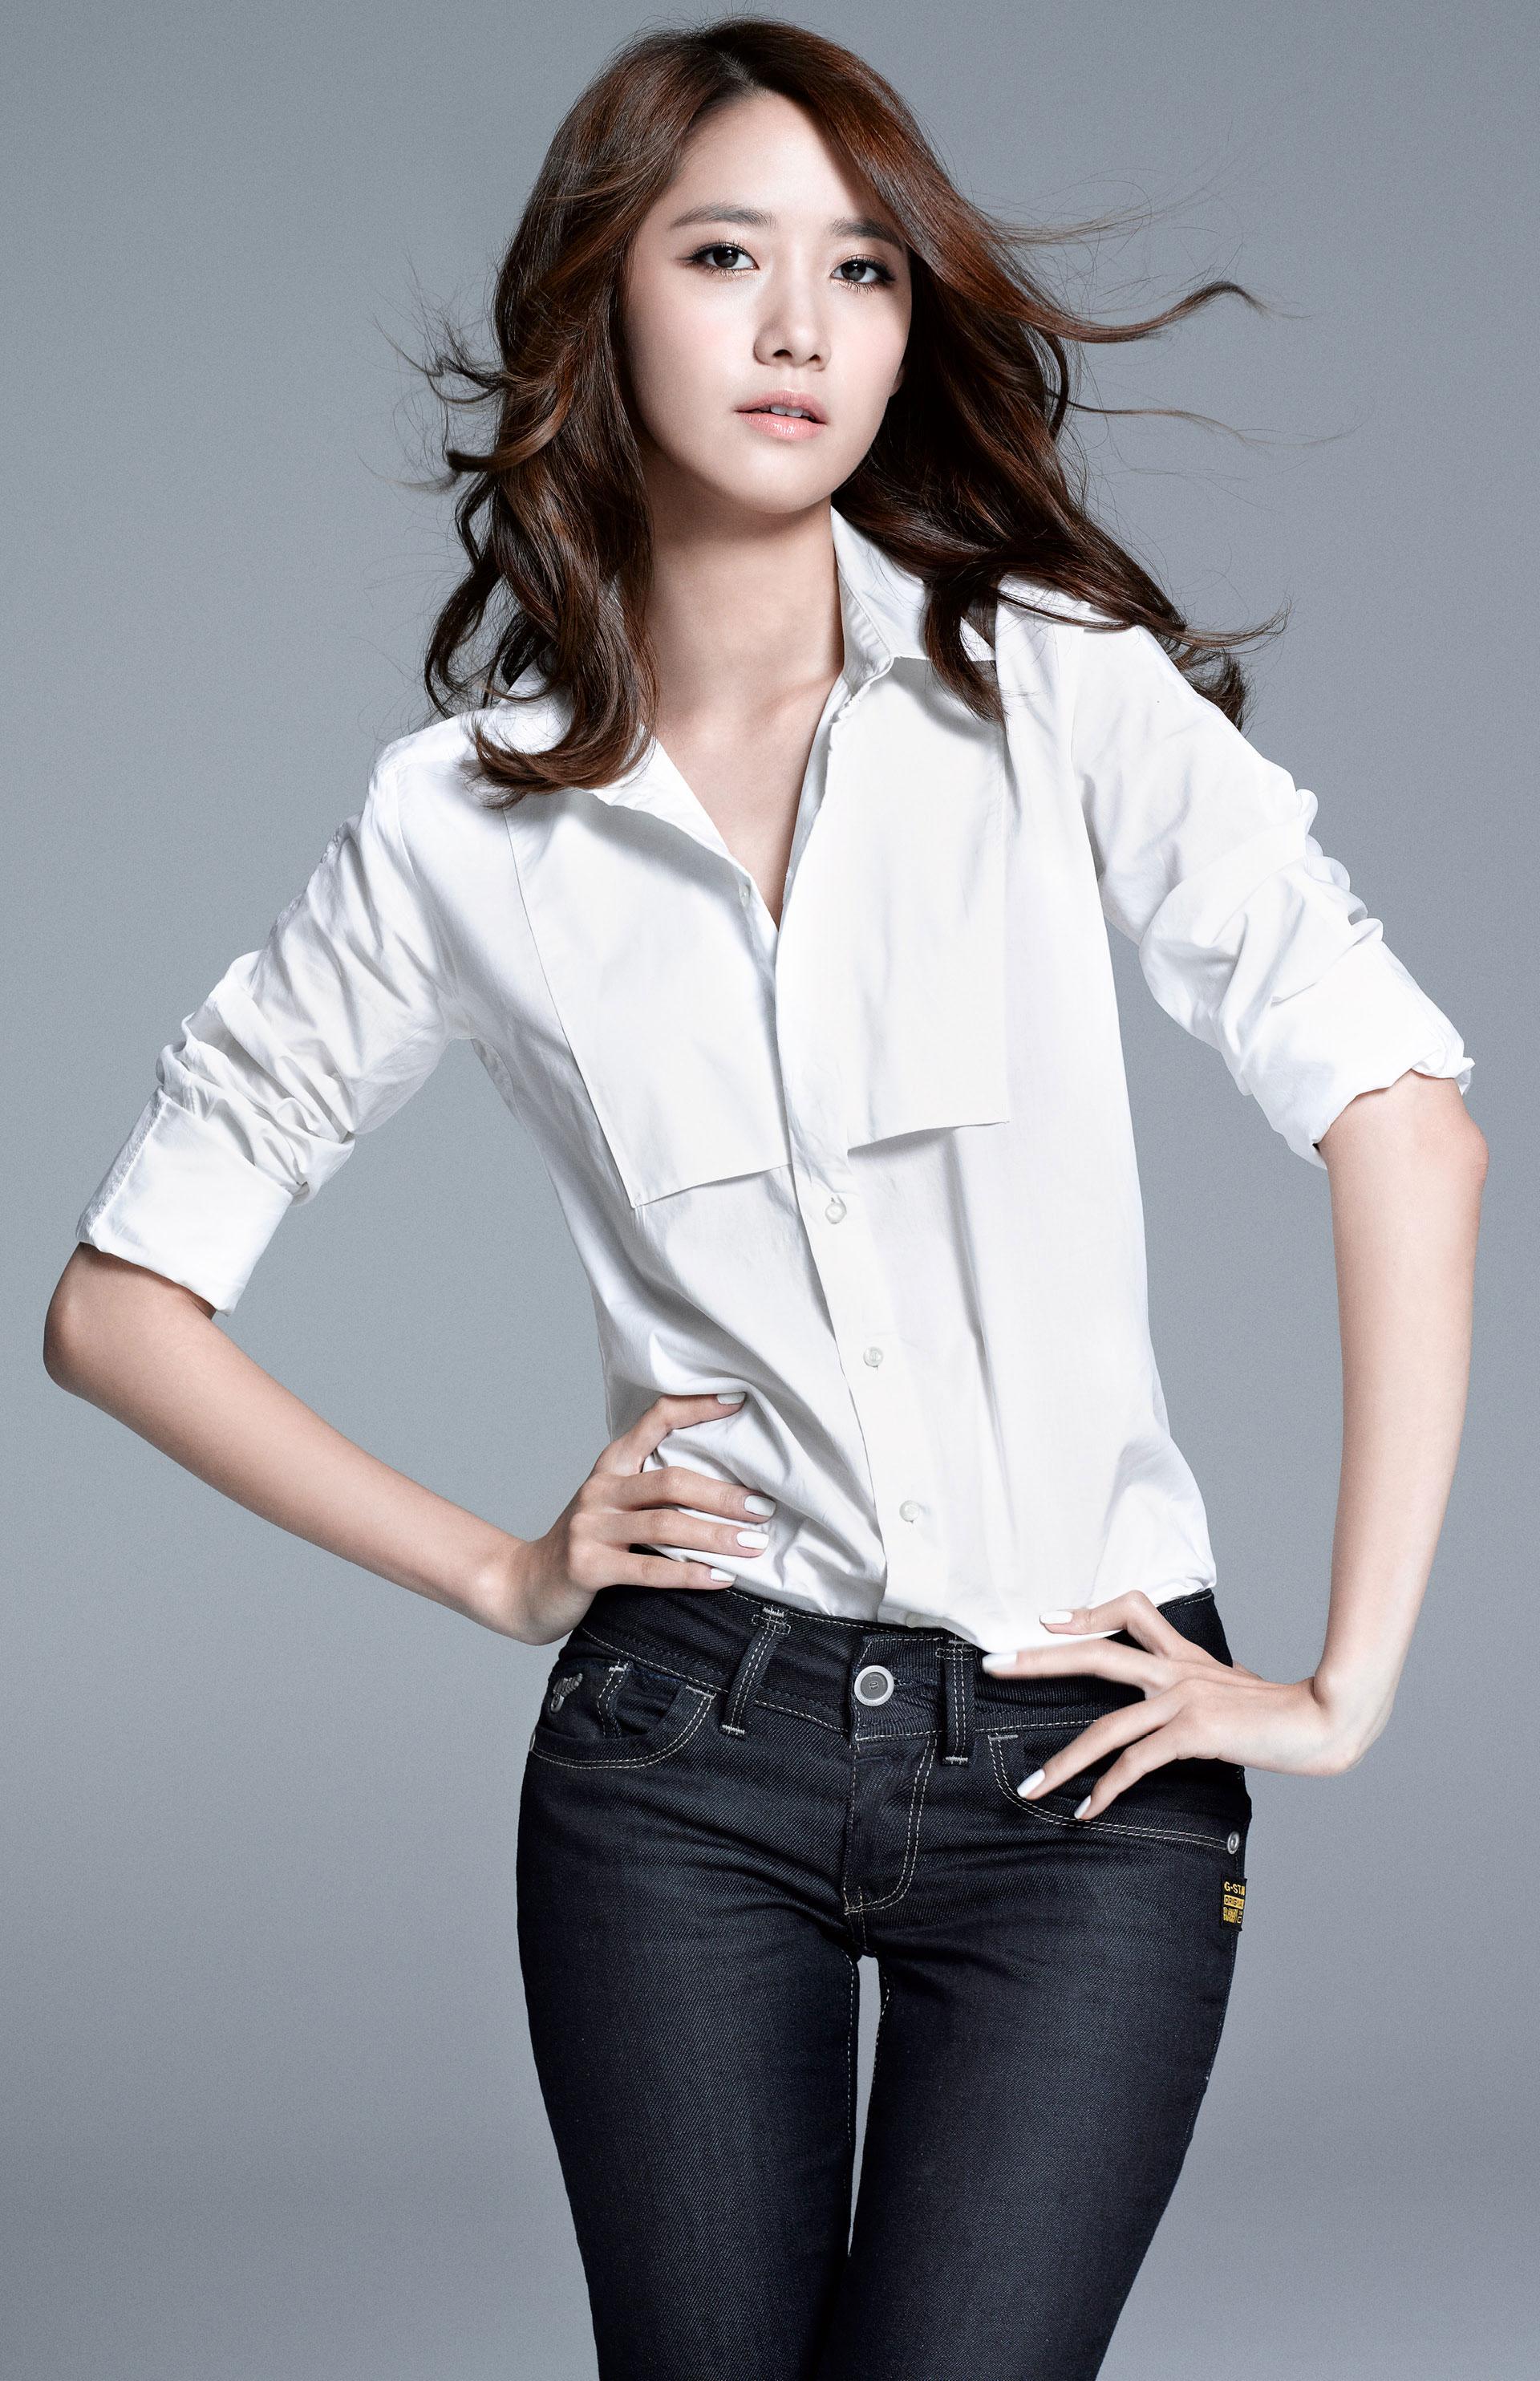 Snsd Yoona G-star Japan